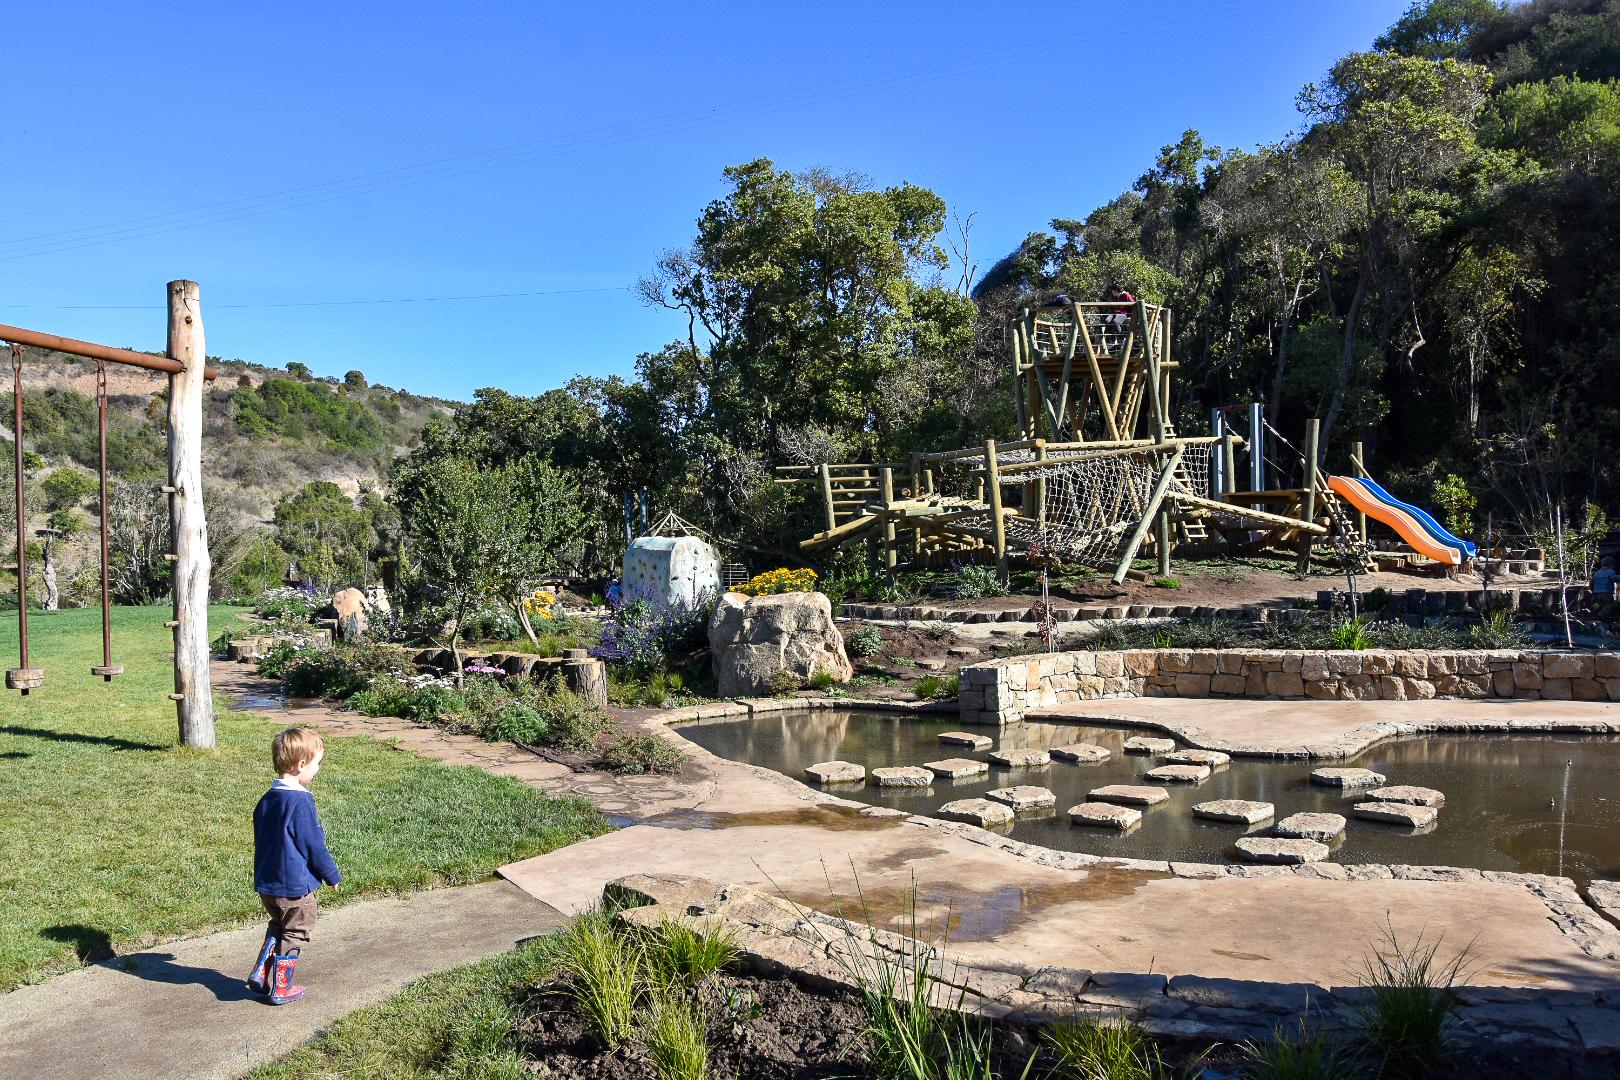 Tricao playground